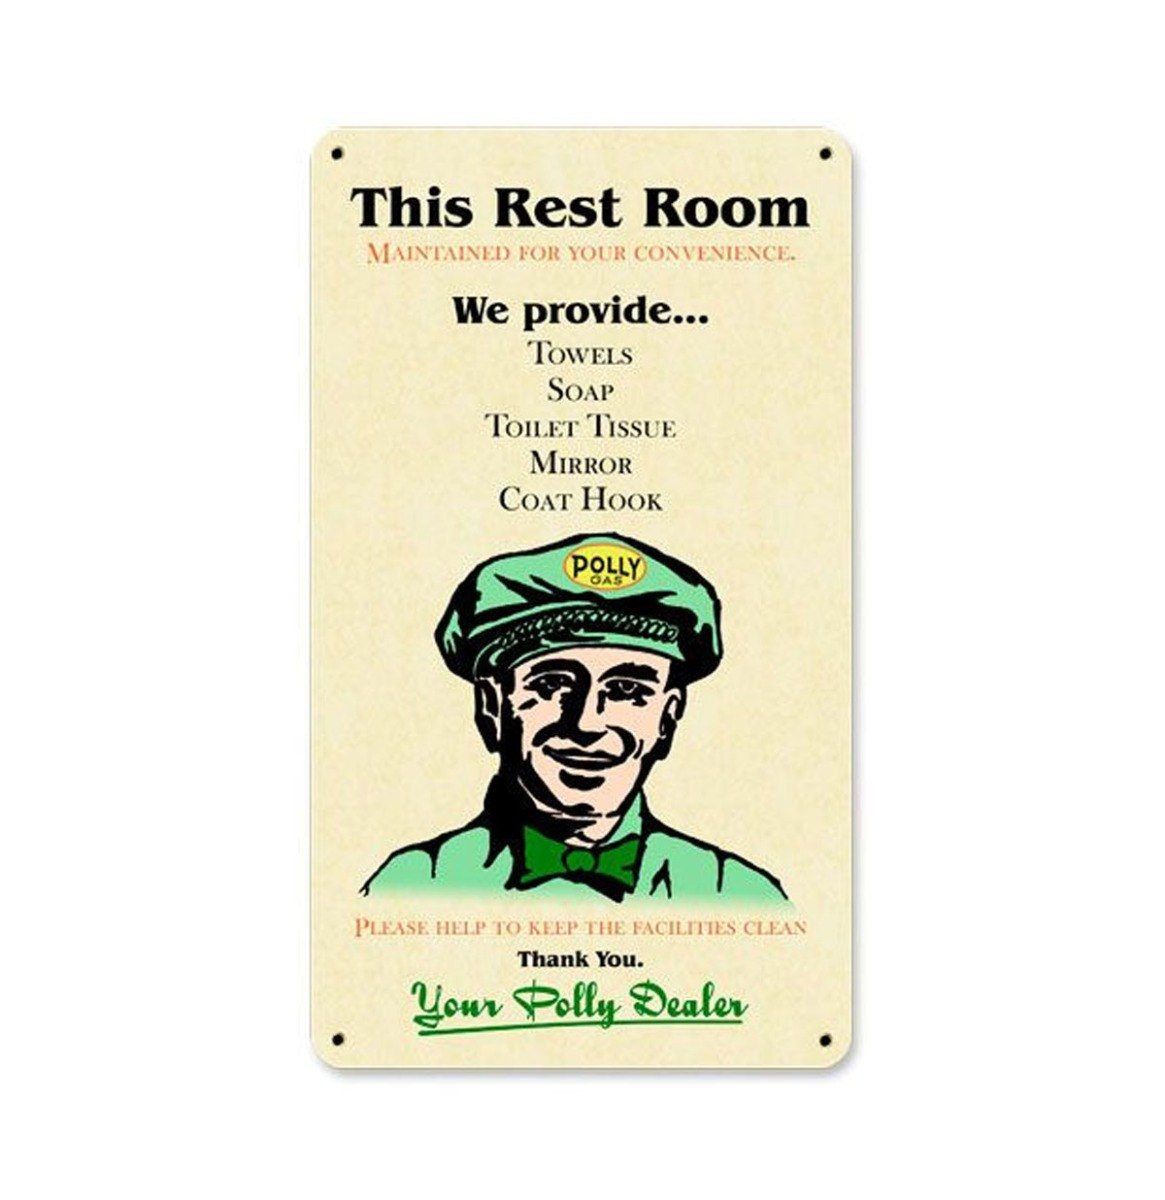 Polly Gas Rest Room Metalen Bord 34,5 x 20,5 cm